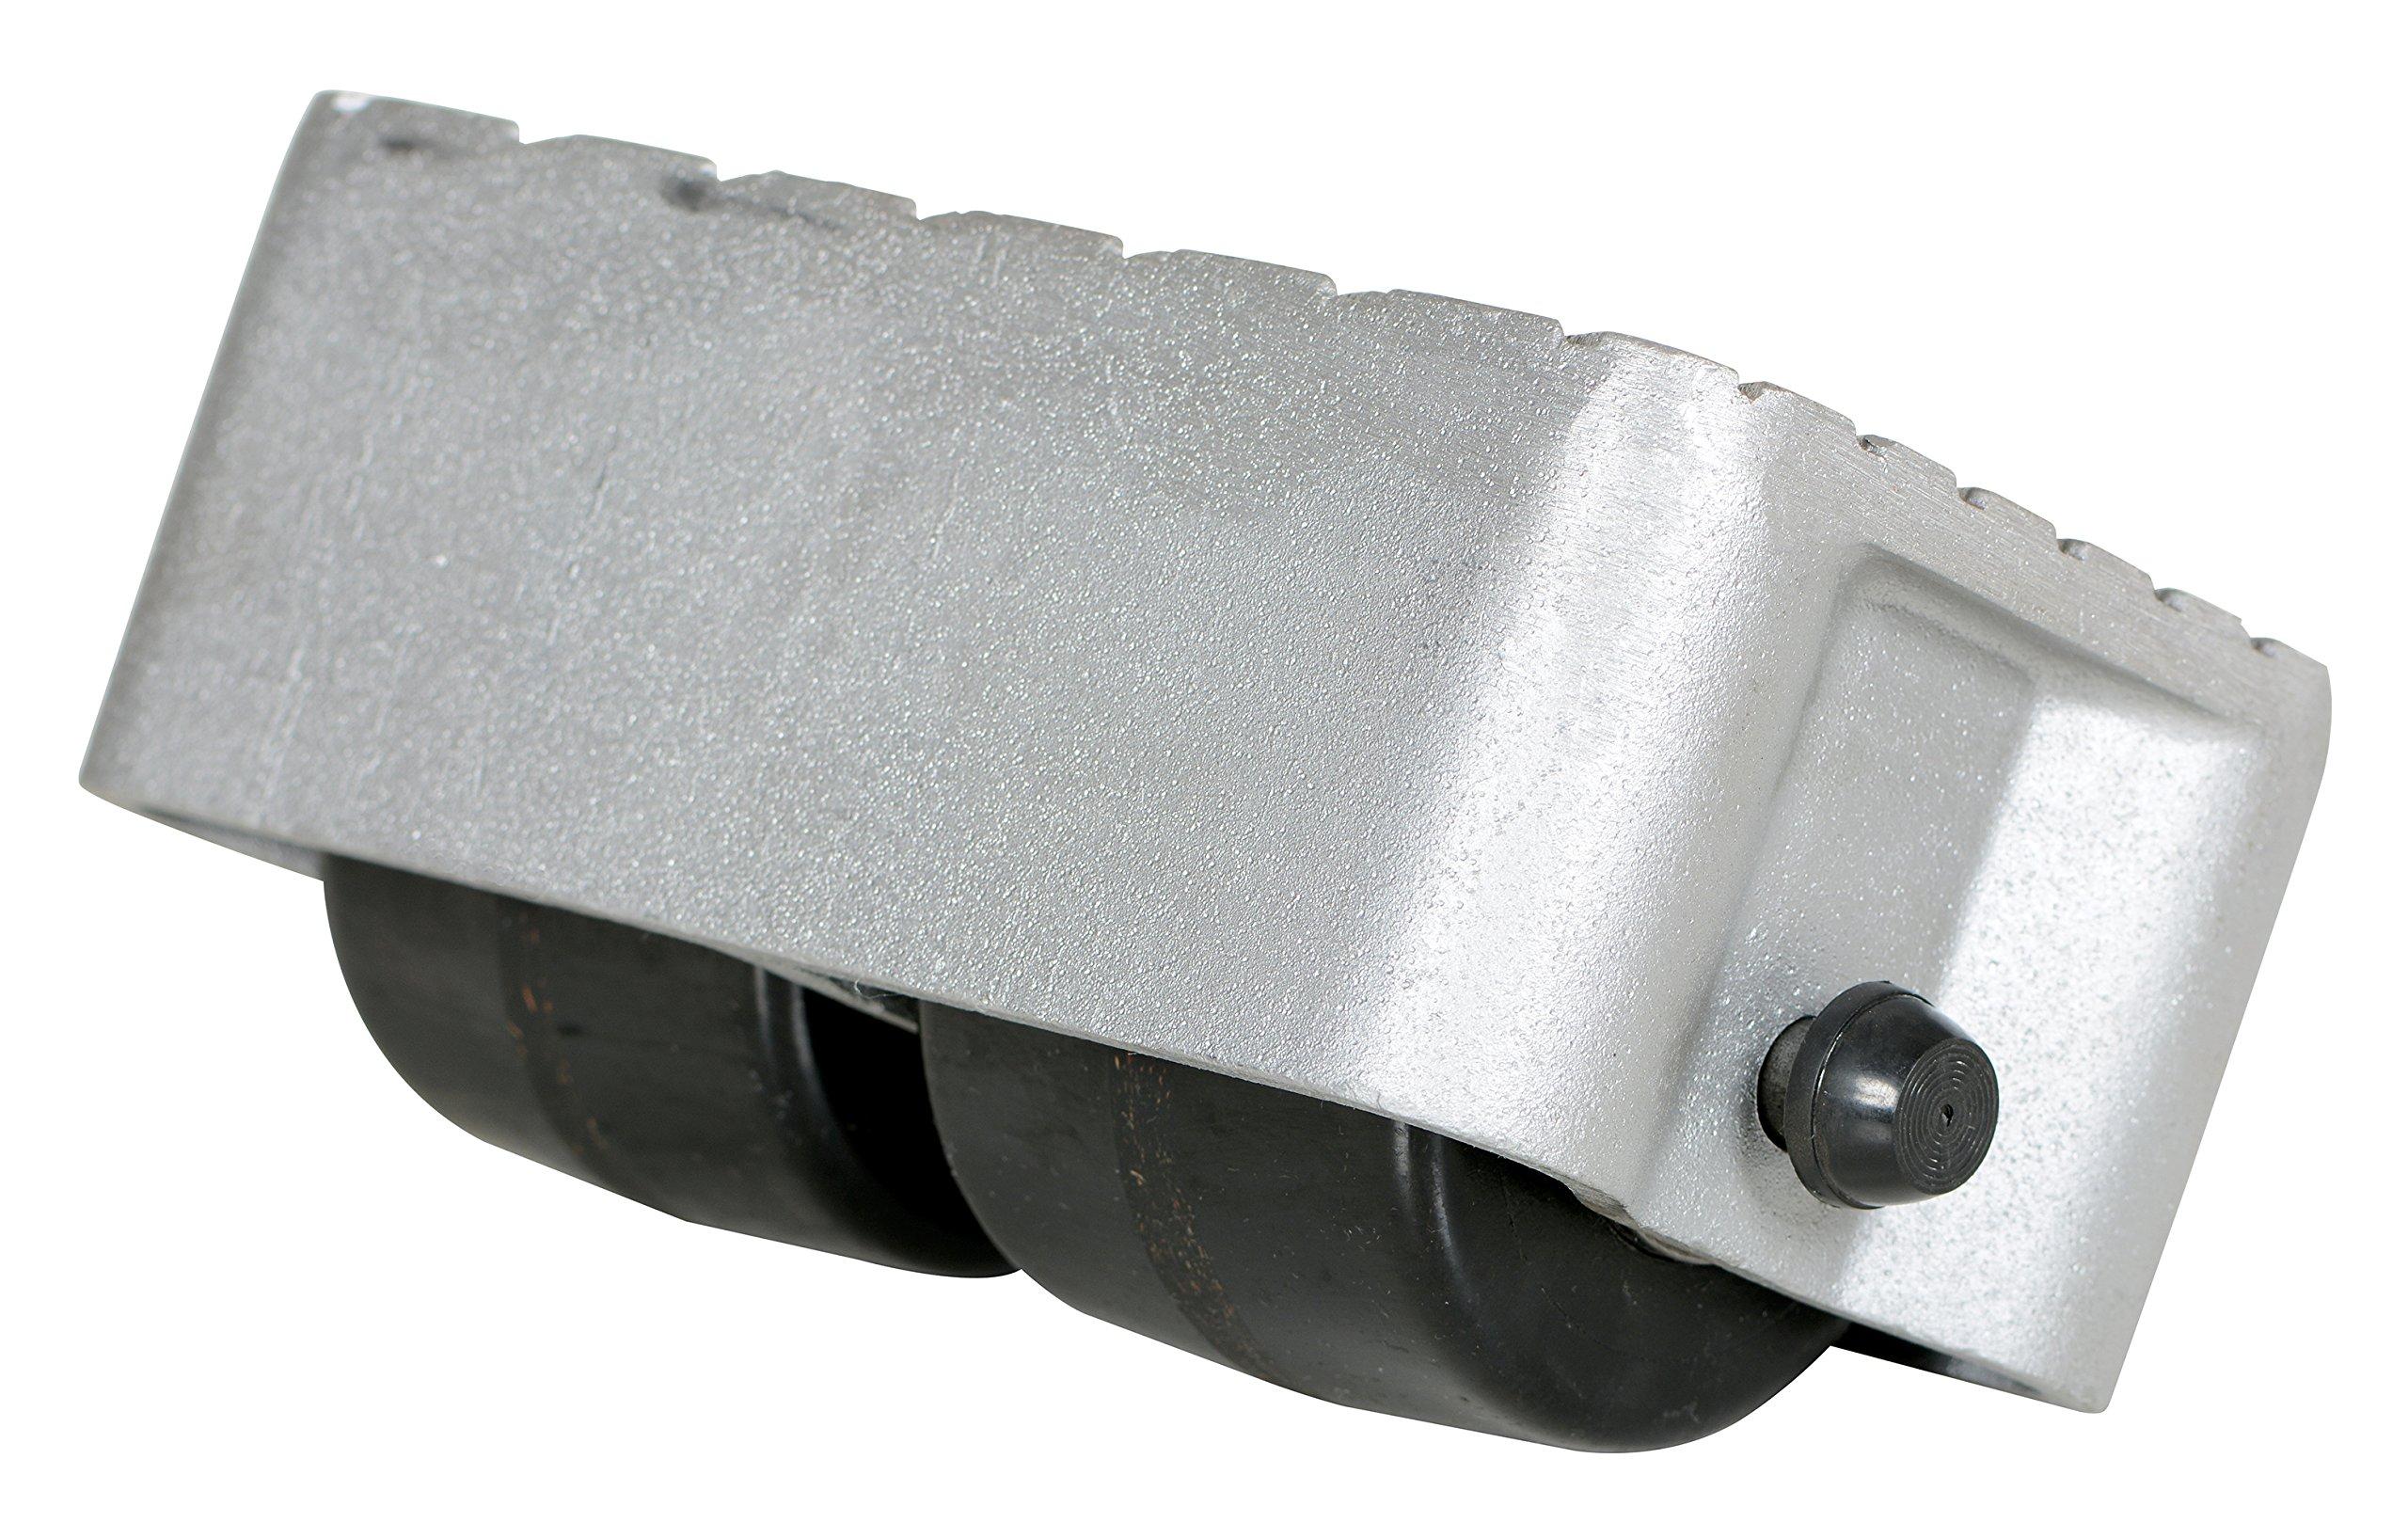 Vestil VPRDO-2 Cast Aluminum Propel Dolly, 3000 lbs Capacity, 8-1/2'' Length x 4-3/4'' Width Deck, 4-1/4'' Overall Height by Vestil (Image #2)